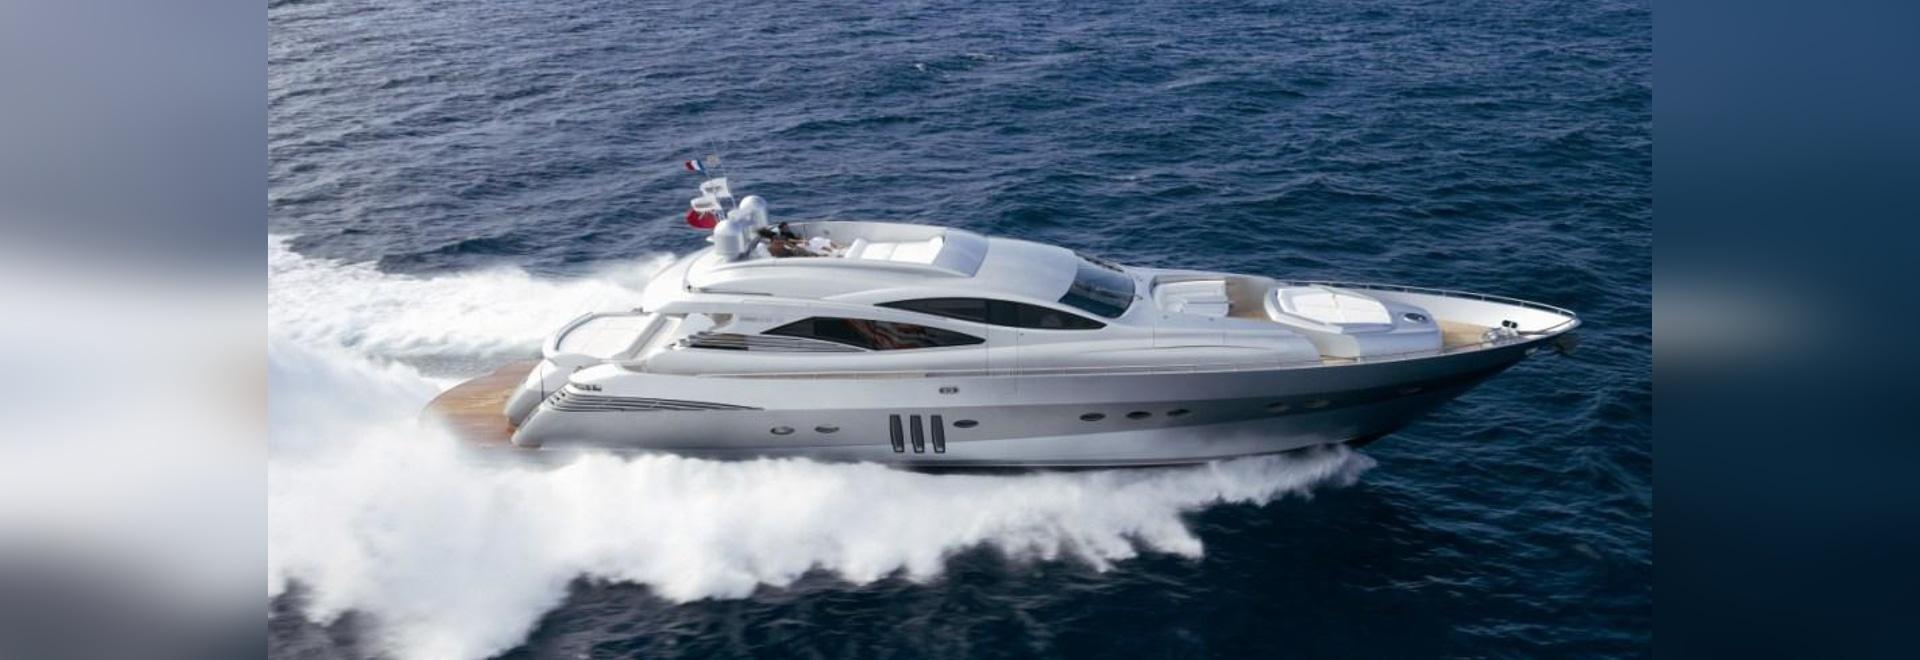 Neu auf dem Markt: 27m Pershing-Motoryacht MM